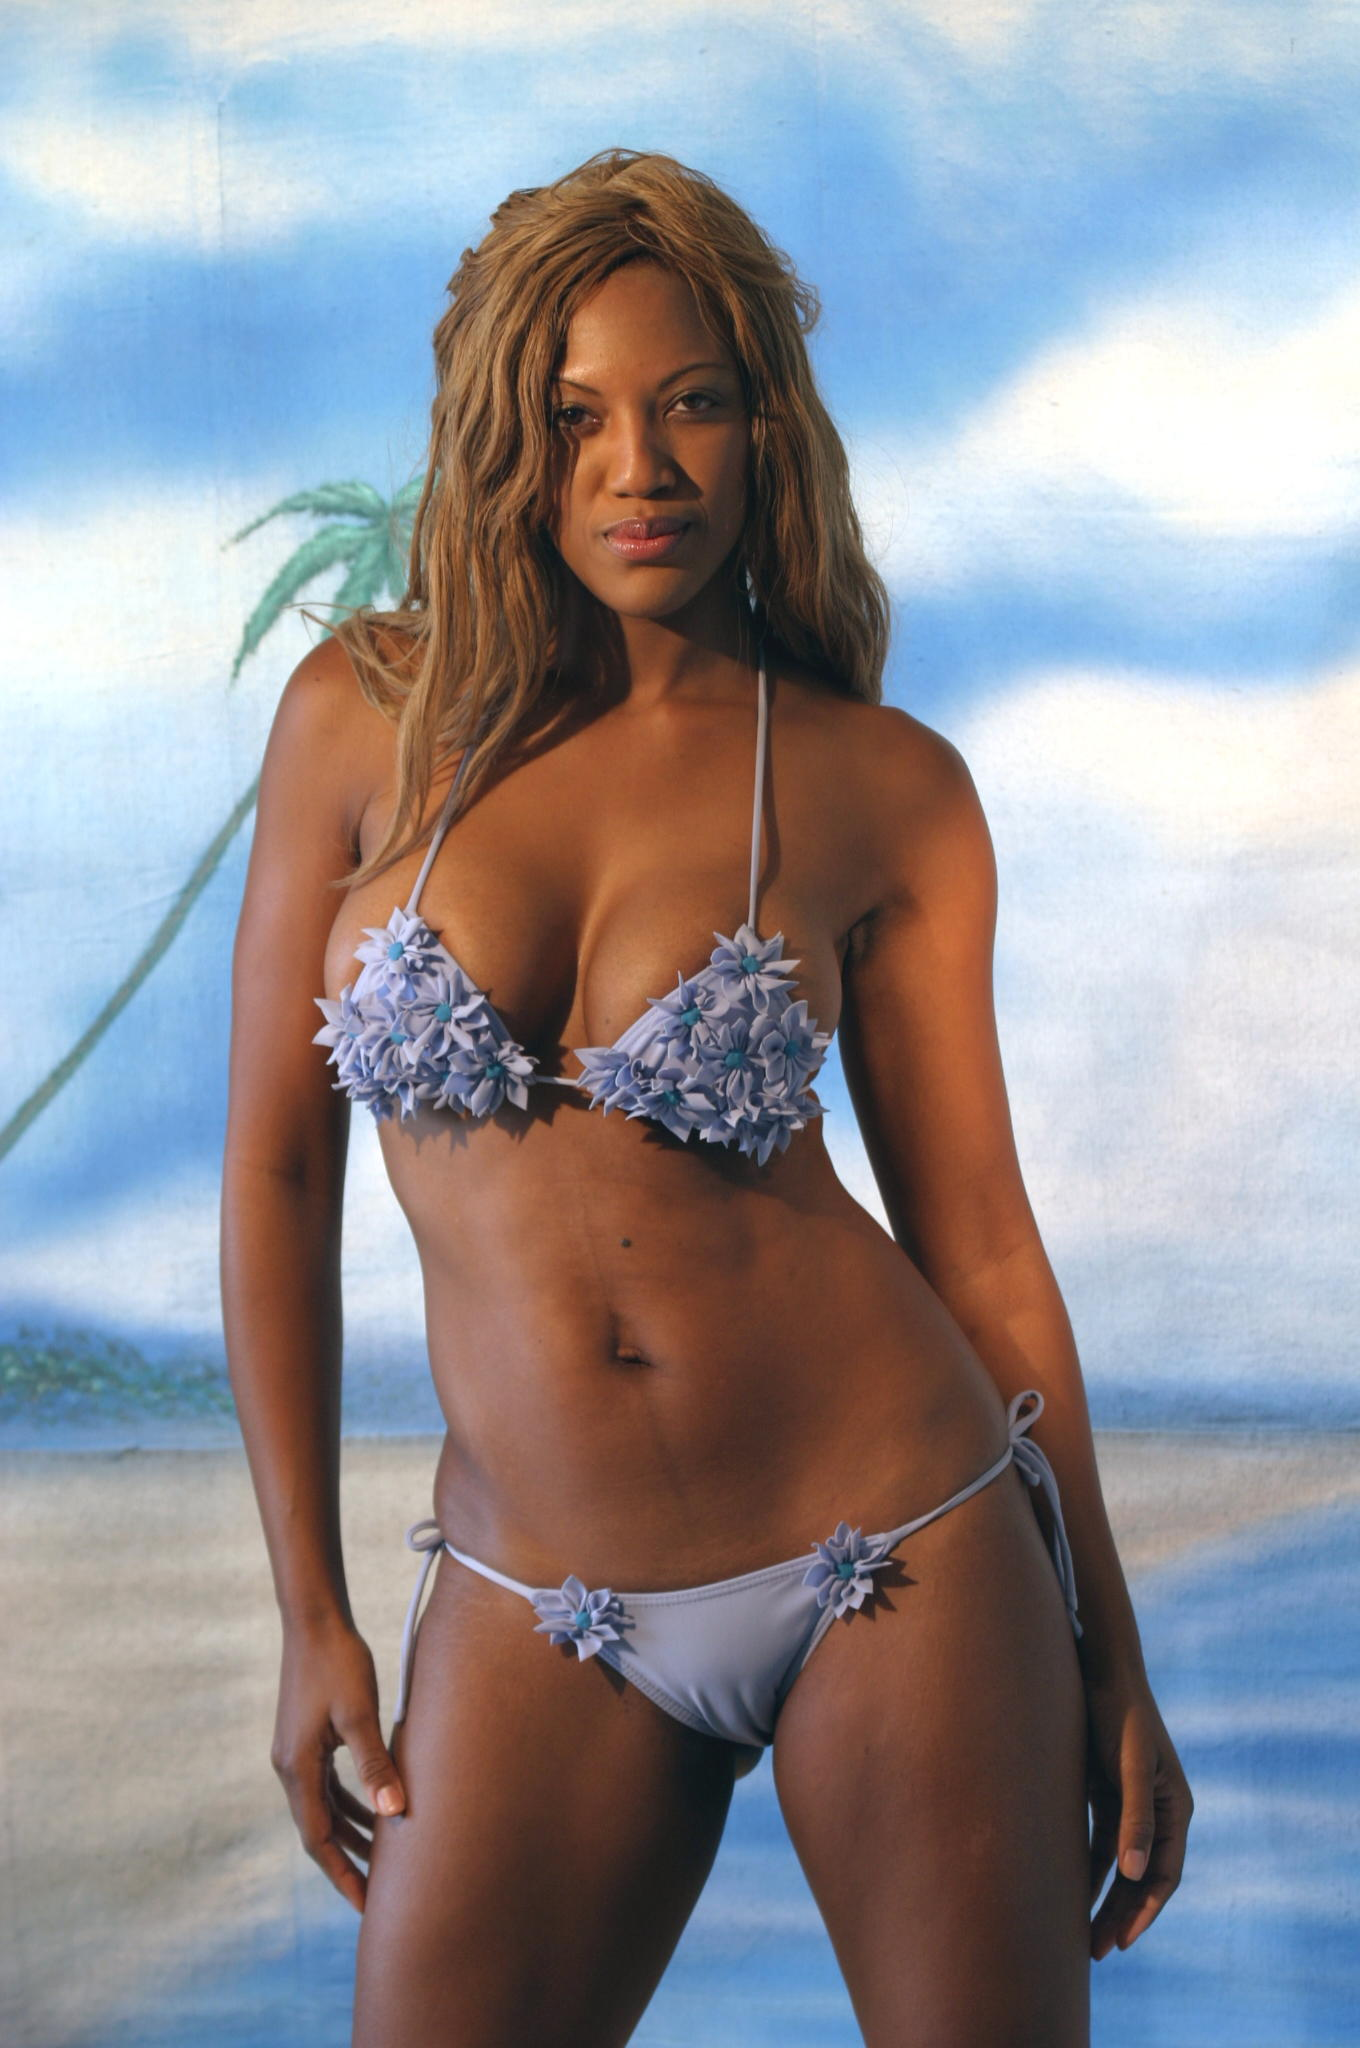 Poorman bikini beach girl naked — img 2